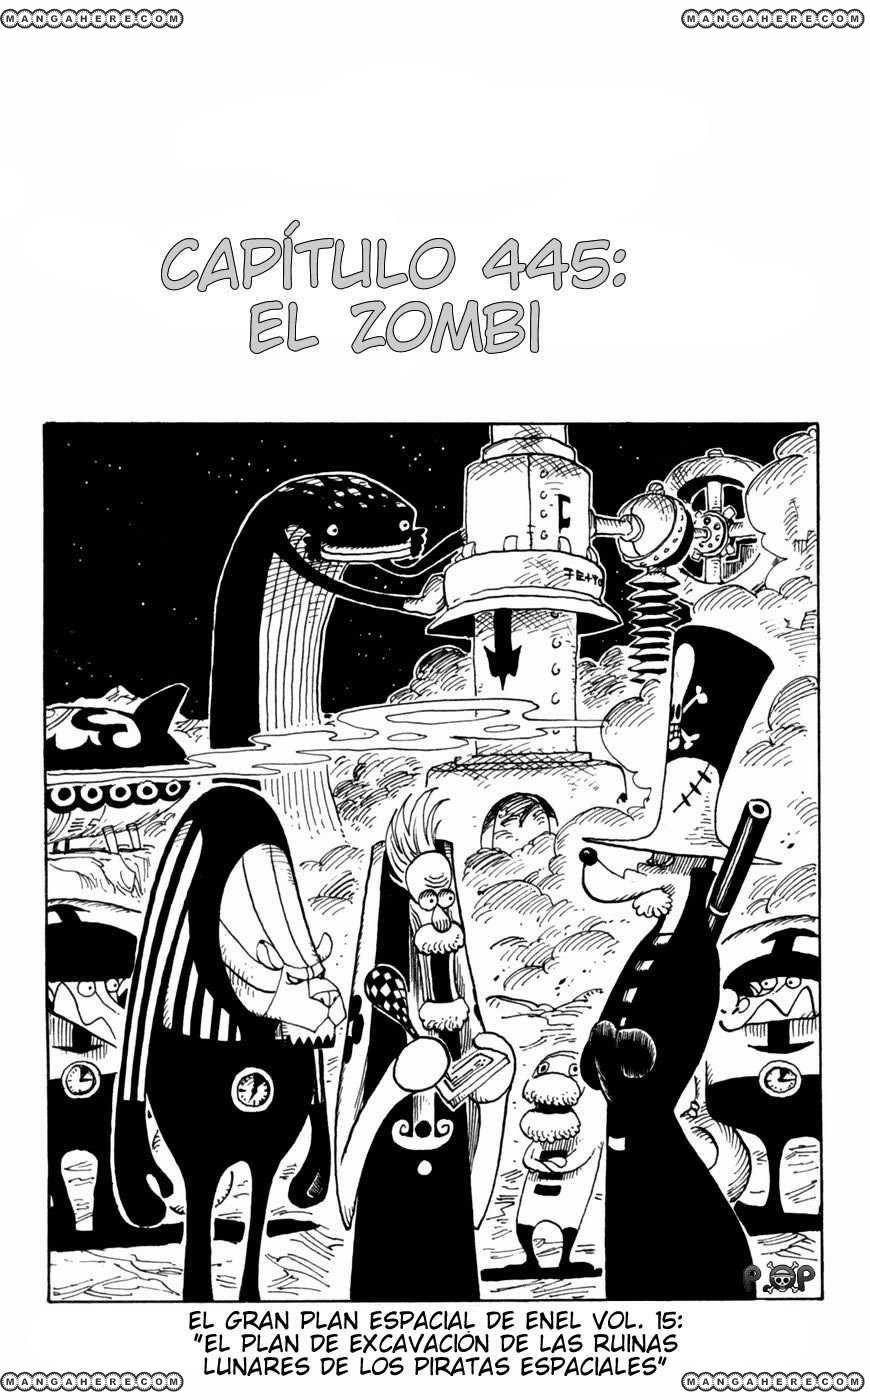 https://c5.ninemanga.com/es_manga/50/114/309735/e46060ebe60134e00b6c6bbcfe77e1f6.jpg Page 1